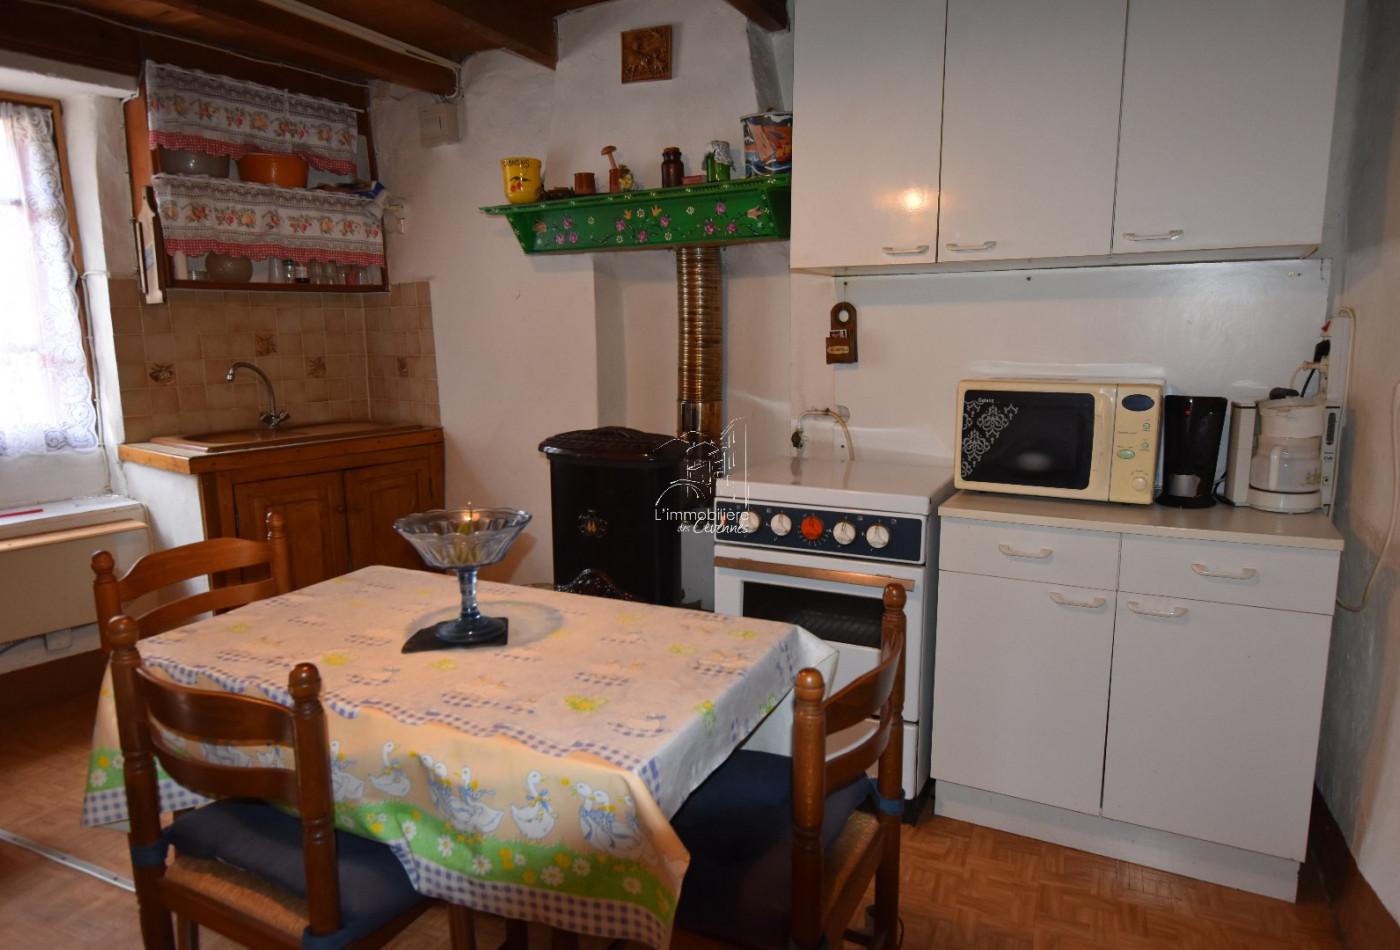 A vendre  Camprieu | Réf 340292391 - Immo3d